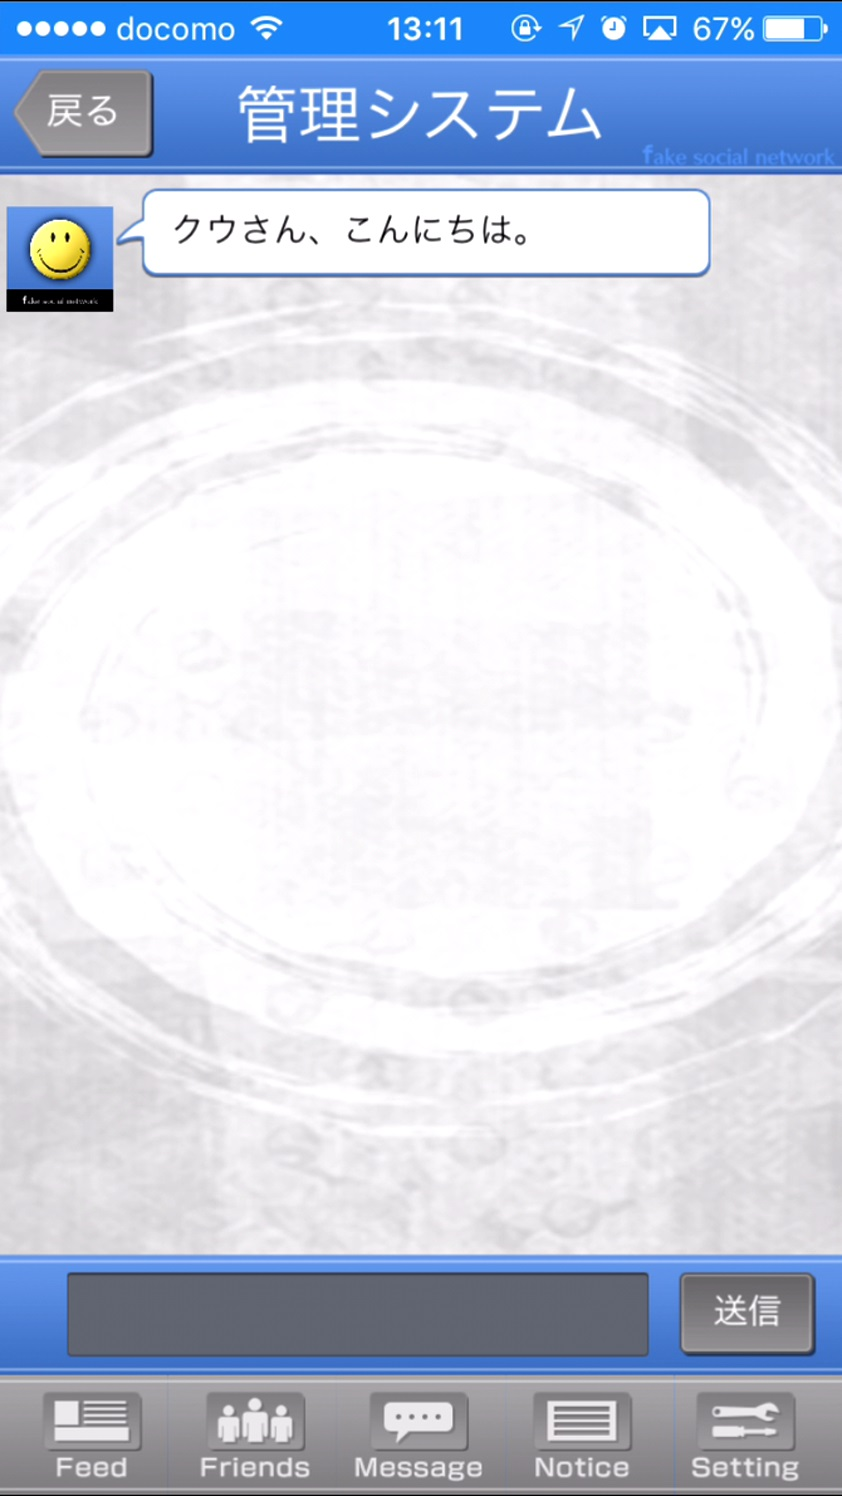 androidアプリ リアルデスゲーム - Fake Social Network -攻略スクリーンショット2